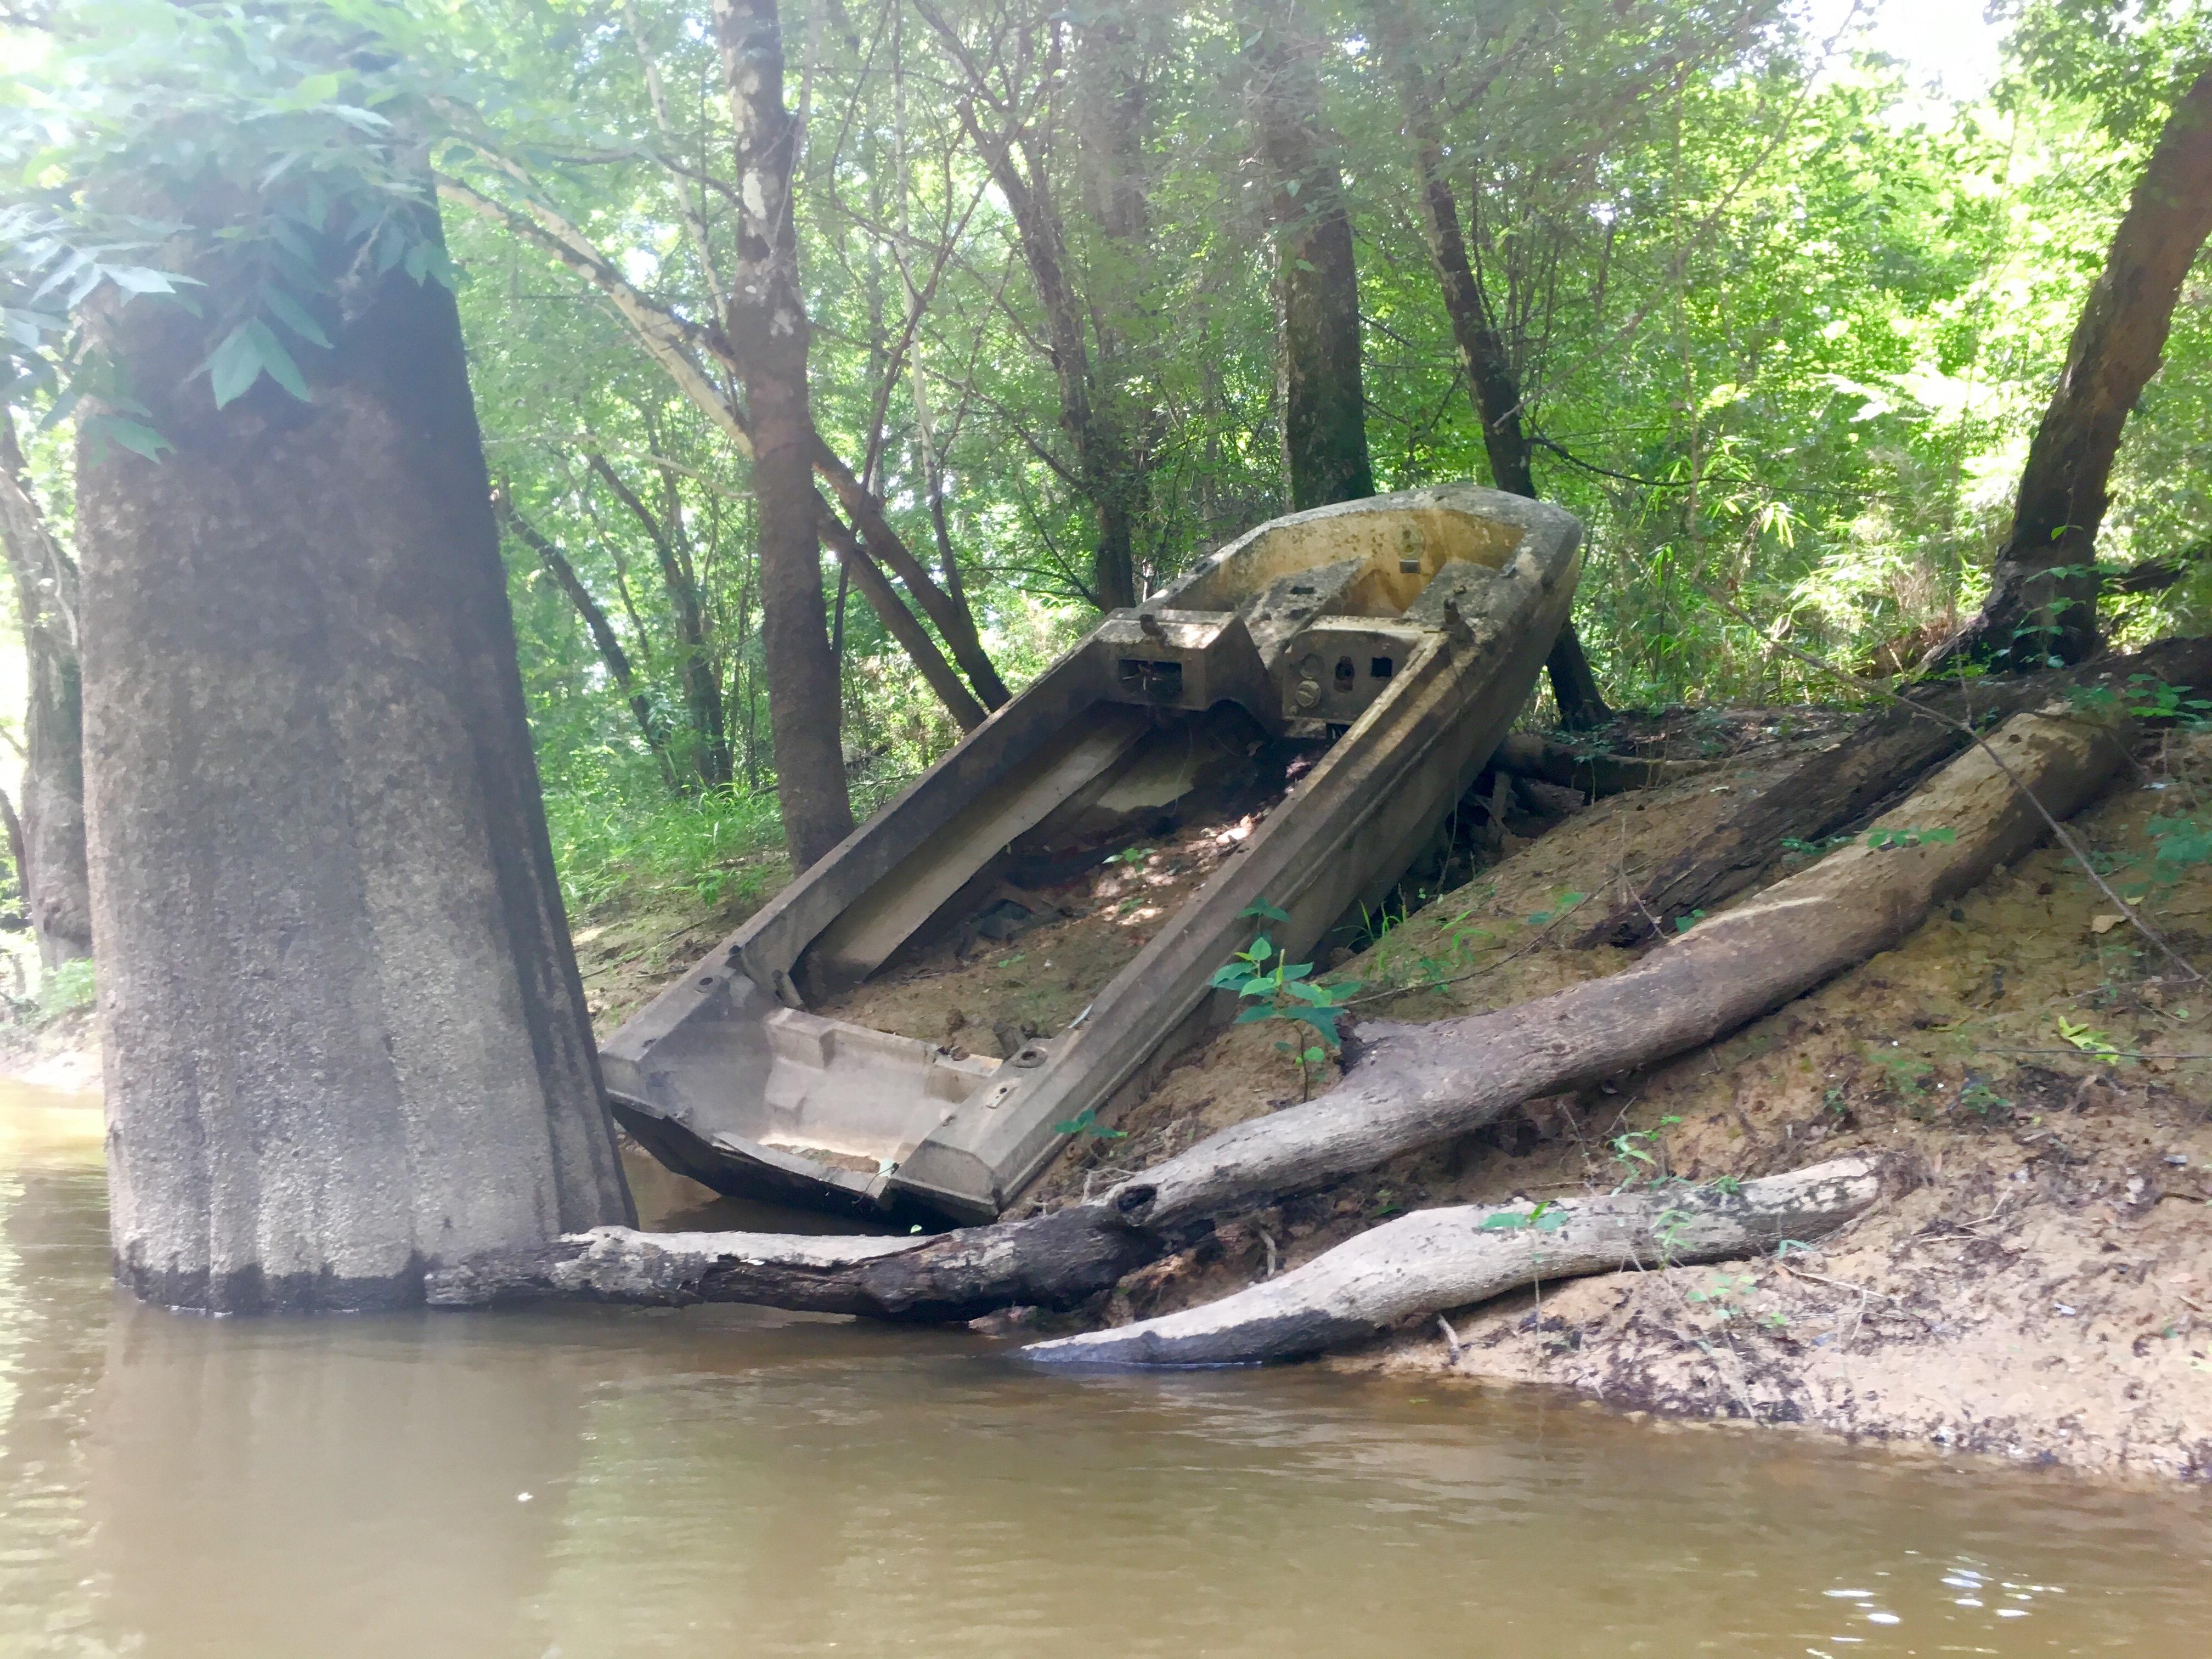 Katrina turned the river bank into a boat graveyard.